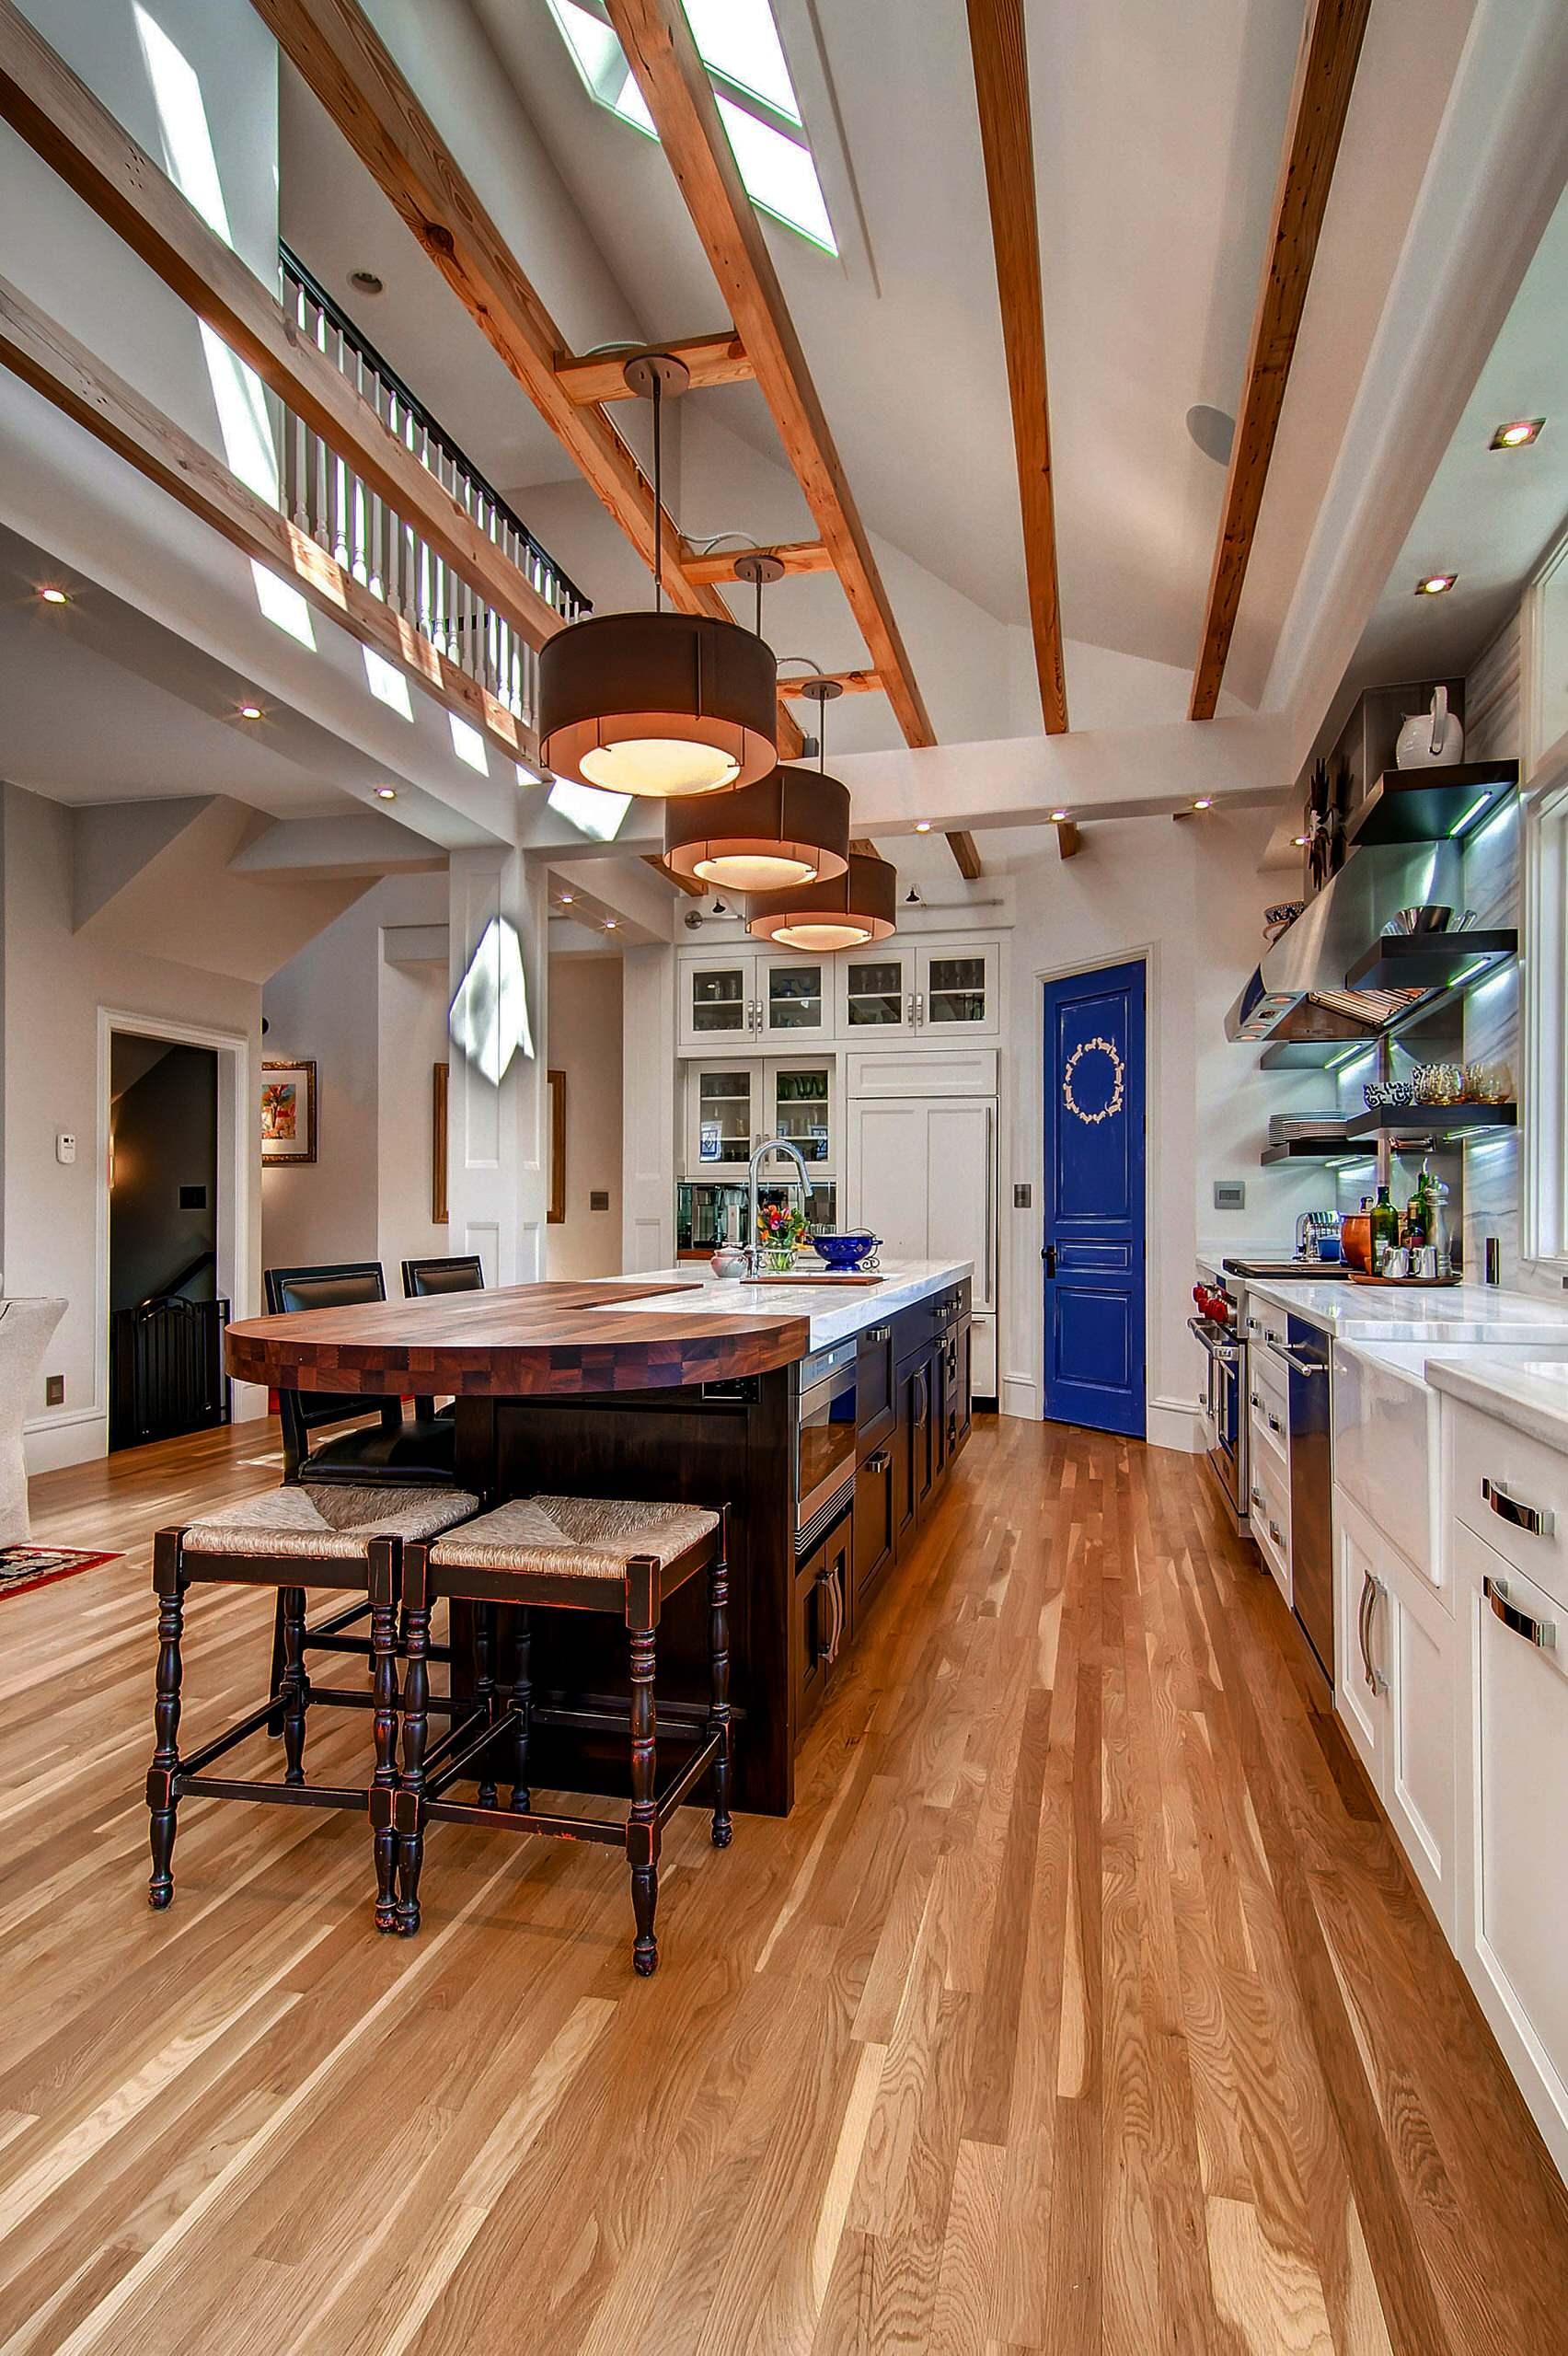 Observatory Park Kitchen and Dining Room Renovation